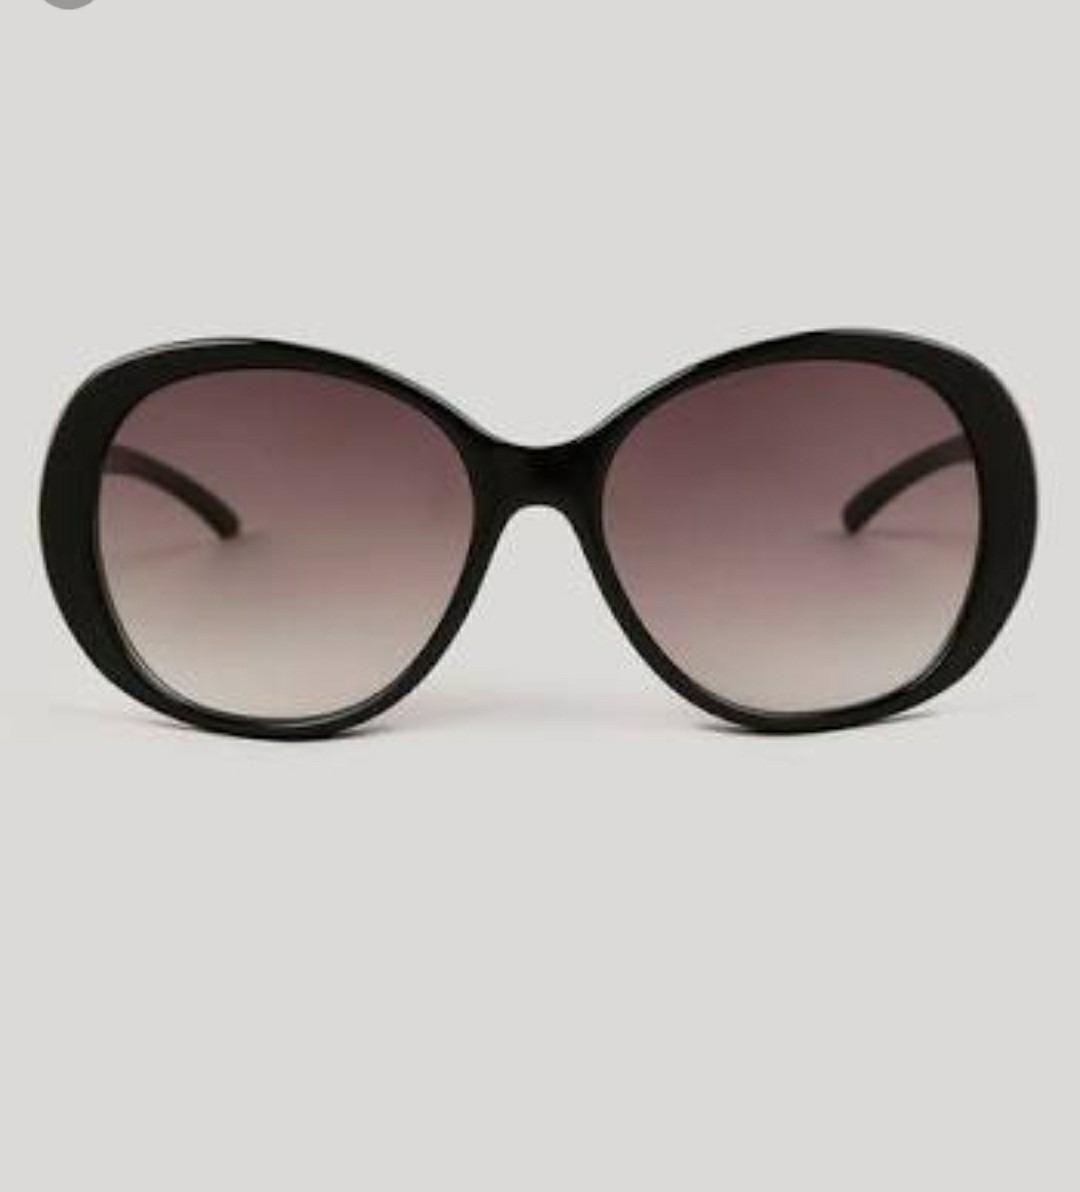 75663bb40b53f óculos preto feminino lente degrade tendencia grande redondo. Carregando  zoom.